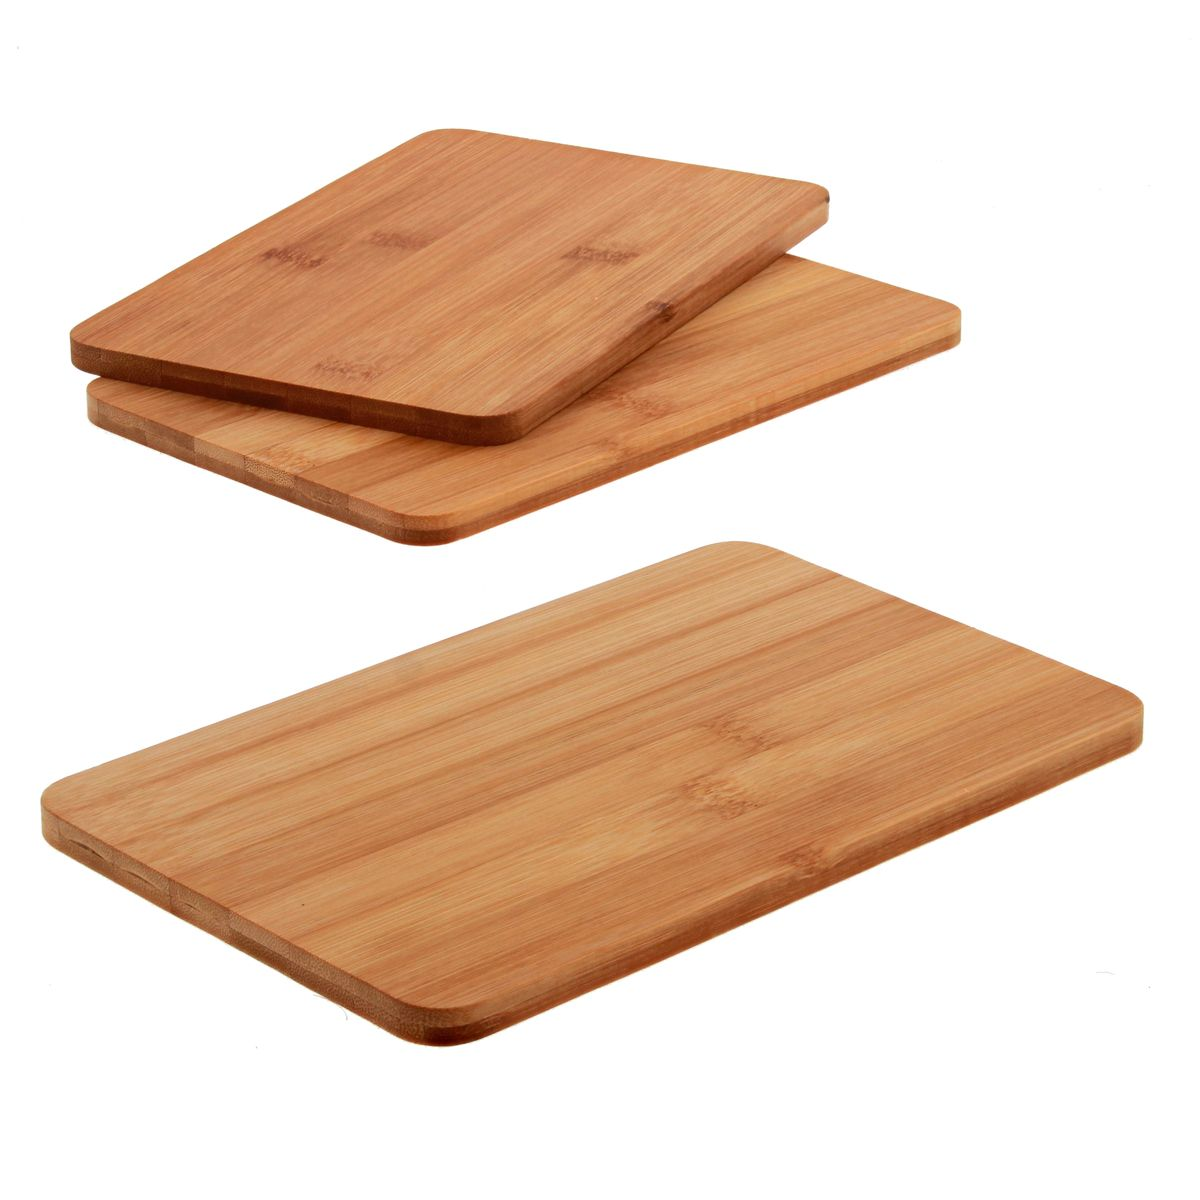 Lot 3 planches en bambou 22 x 14 cm - Zeller